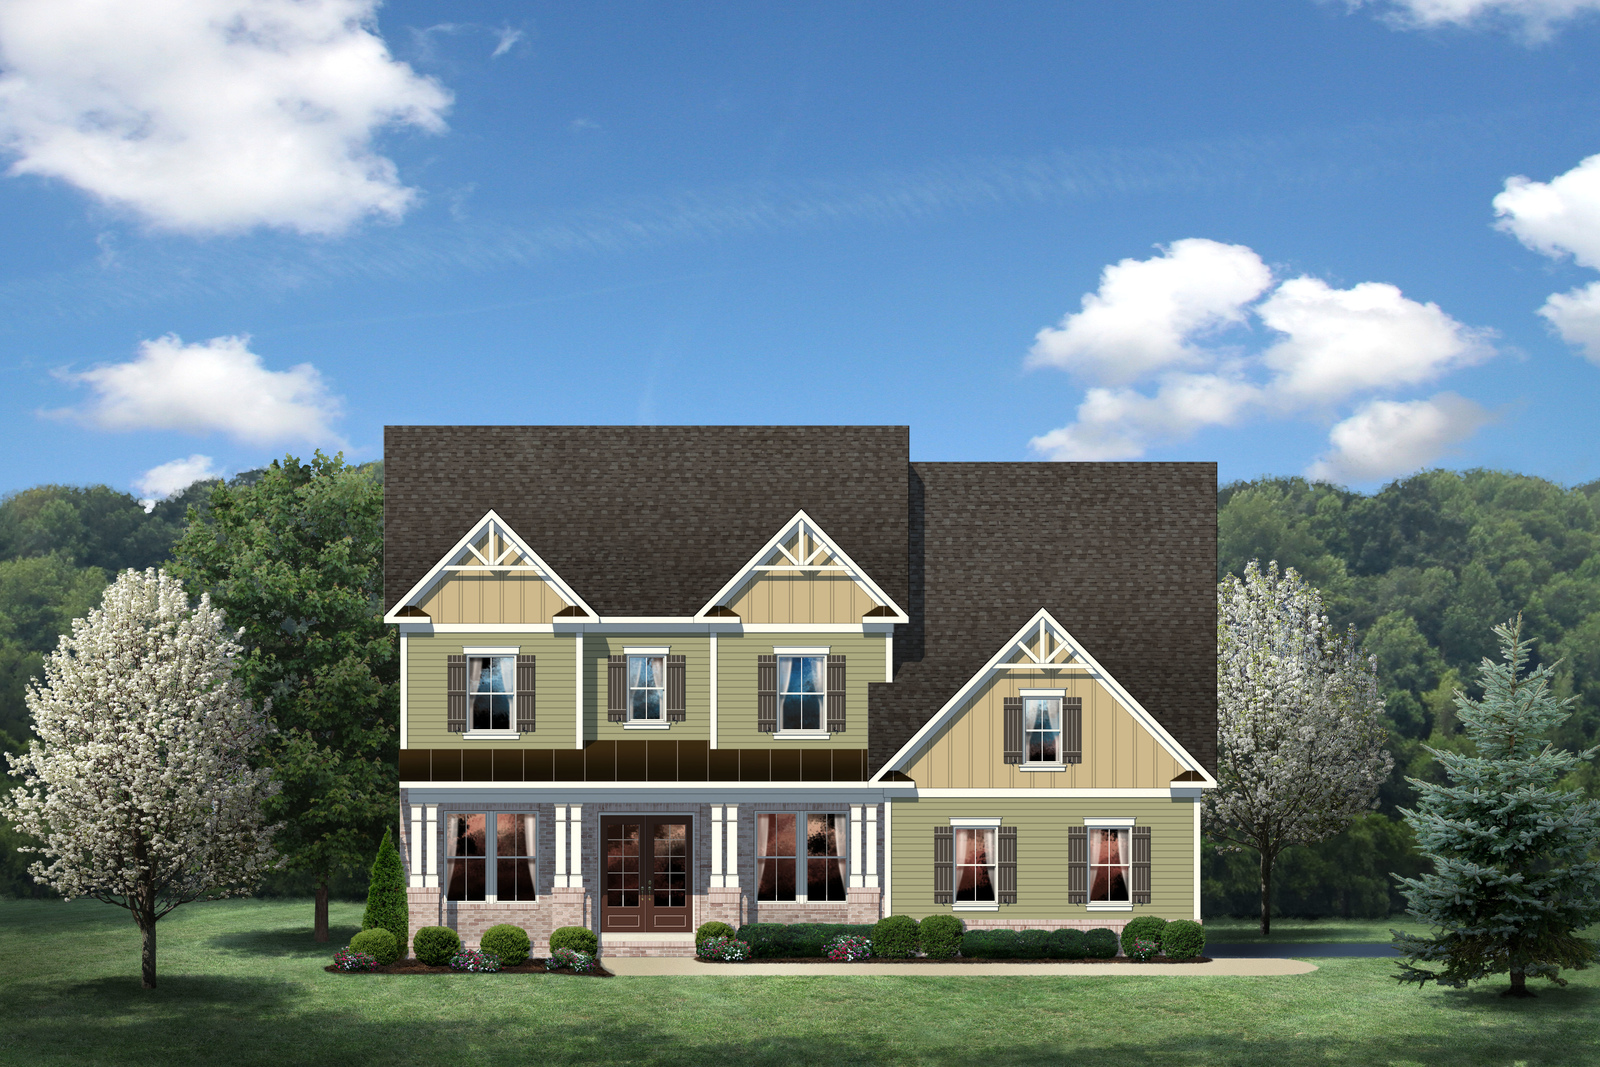 New Empress Ii Home Model For Sale Heartland Homes